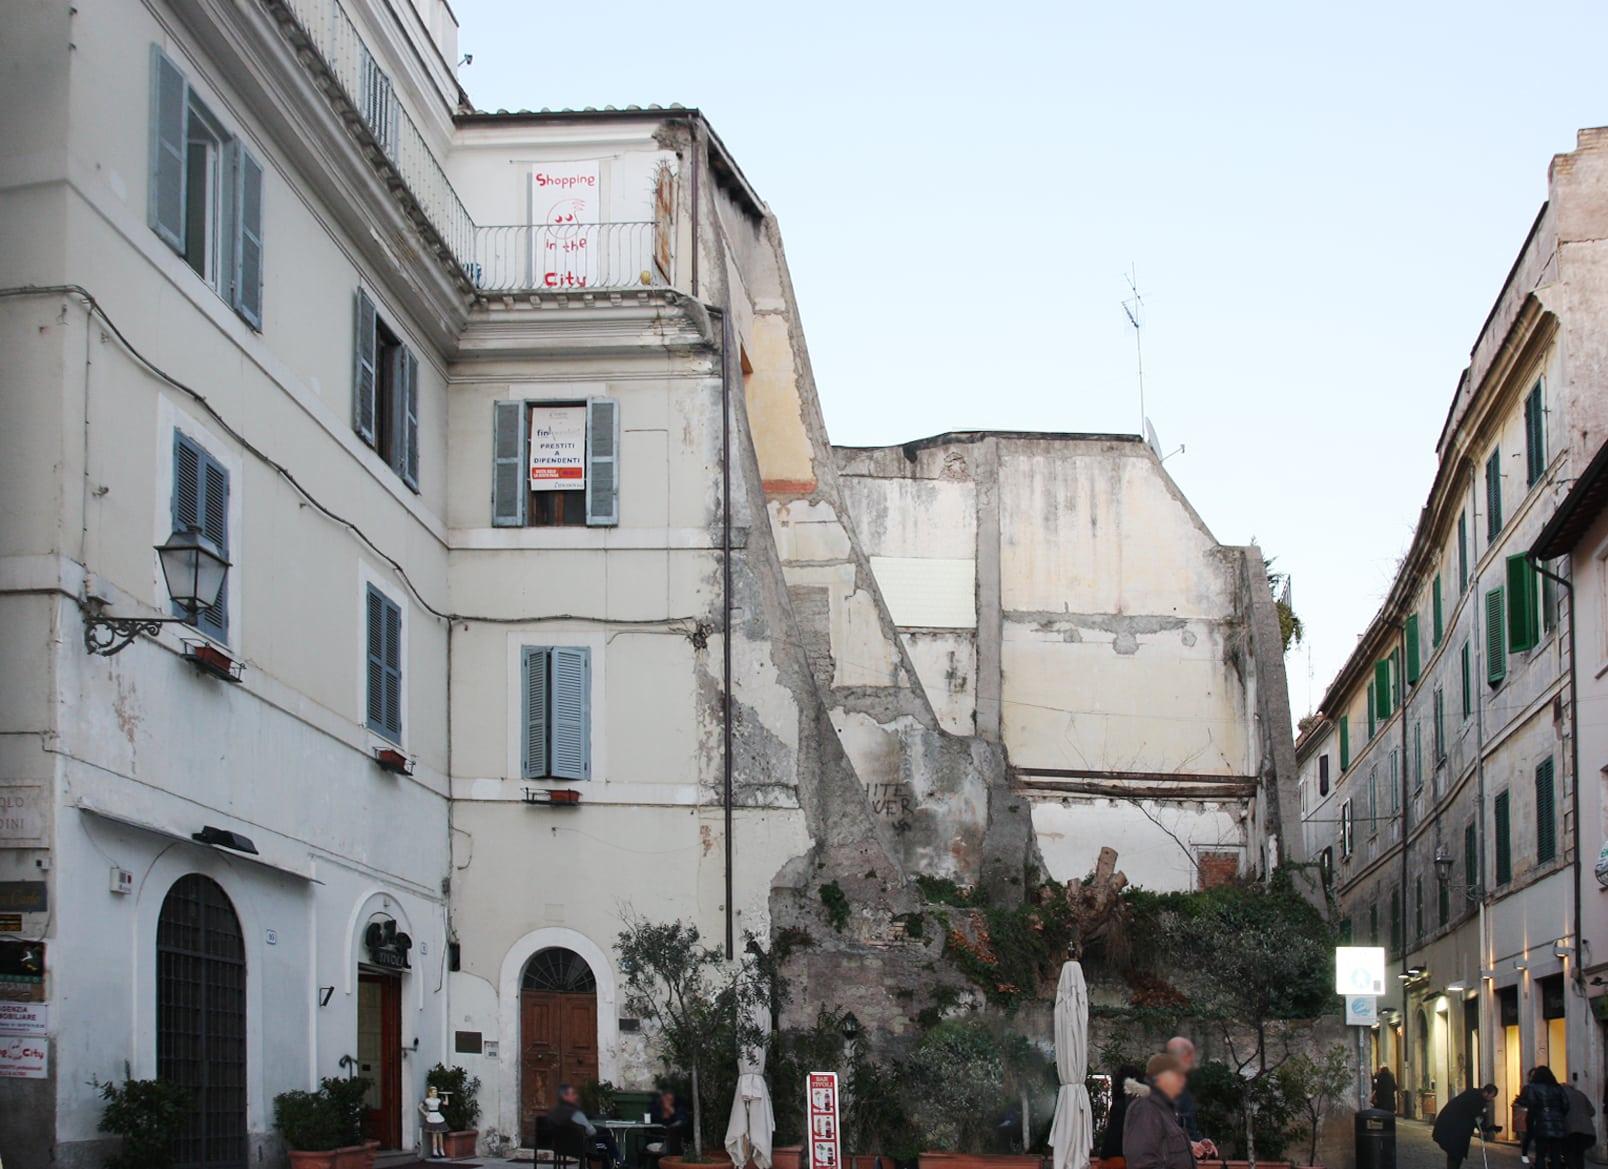 Sparch_Tivoli_Santa Croce - Ante operam